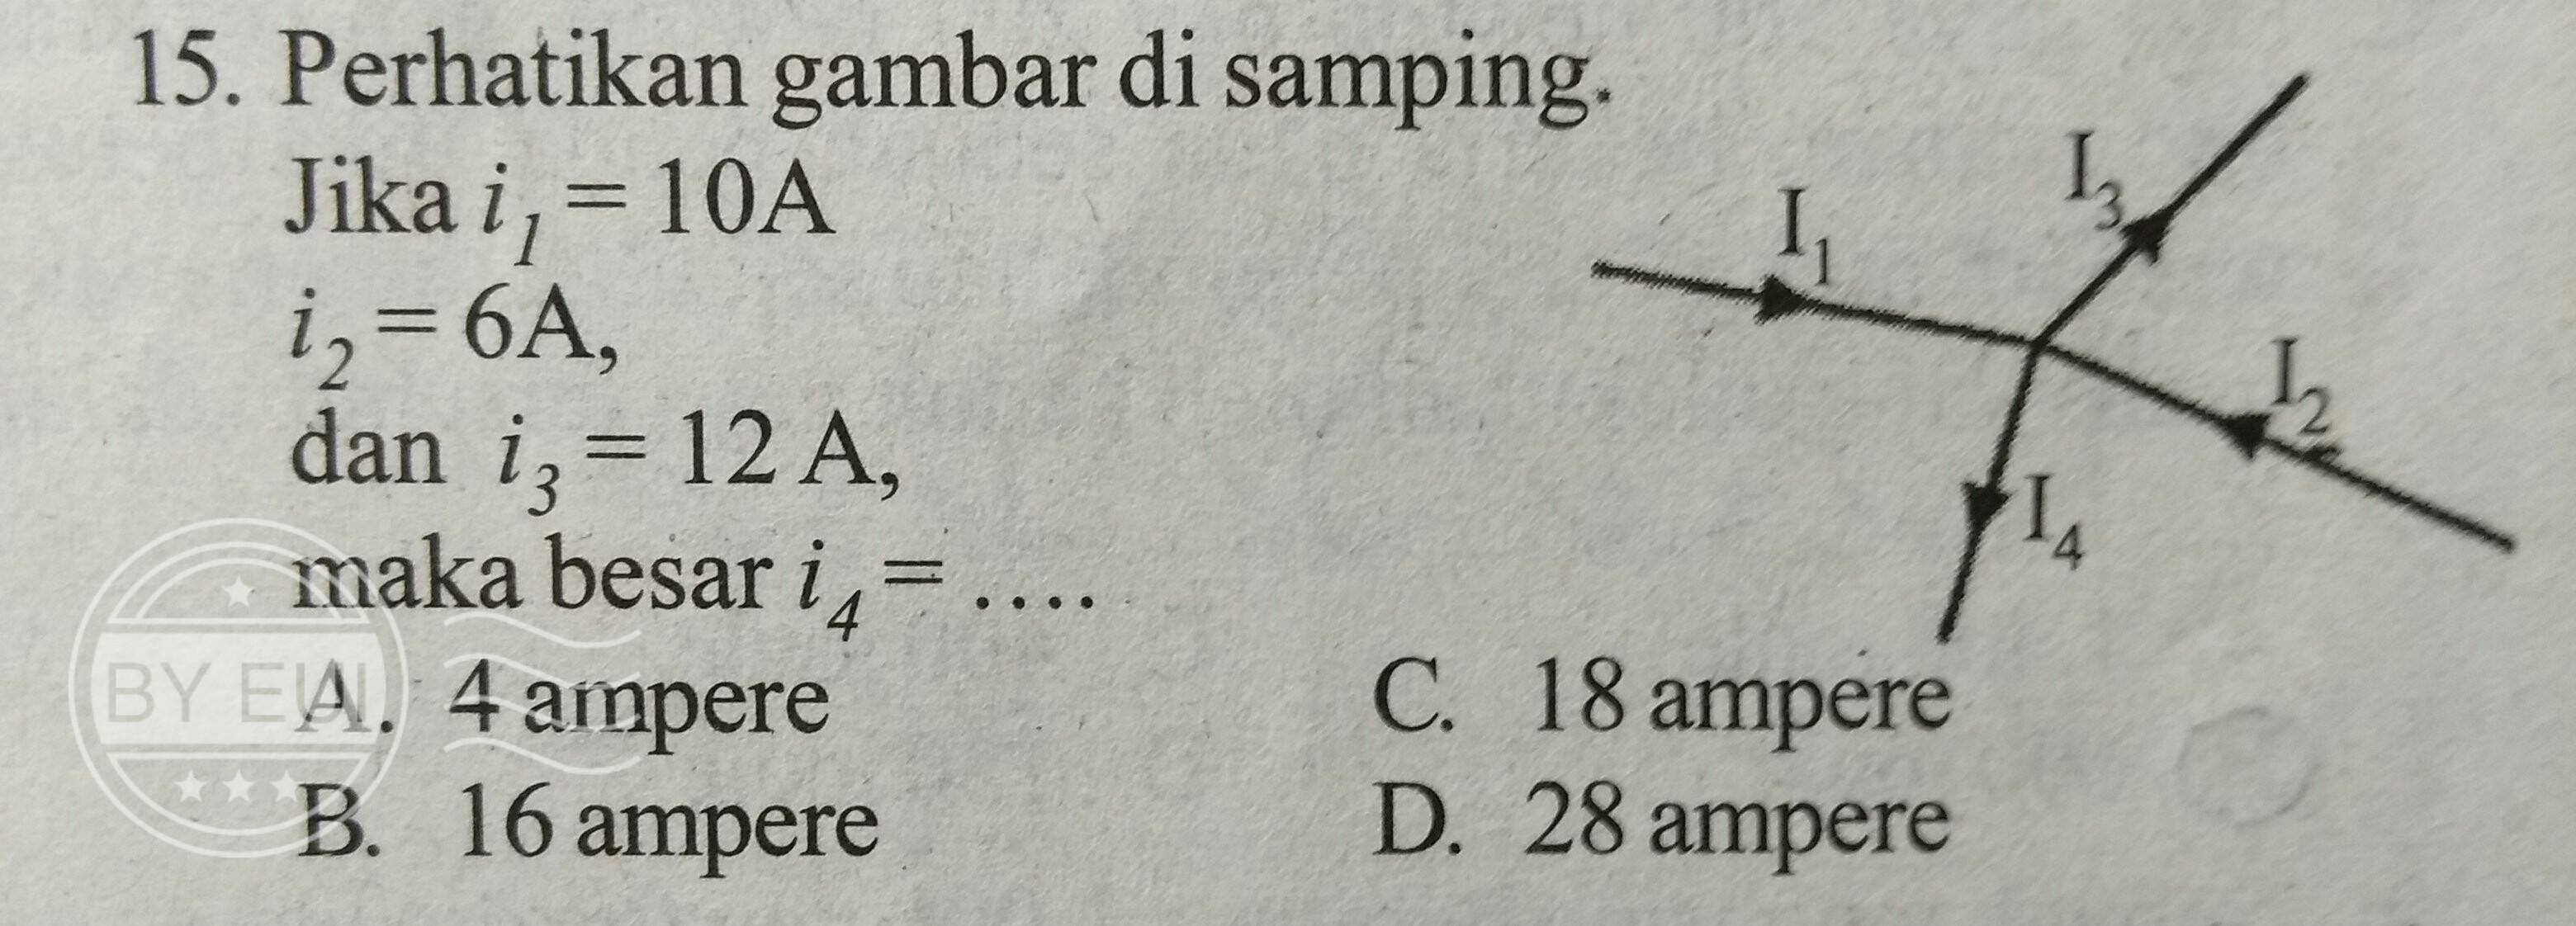 Perhatikan gambar di samping. Jika i1=10A, i2=6A, & i3=12A ...